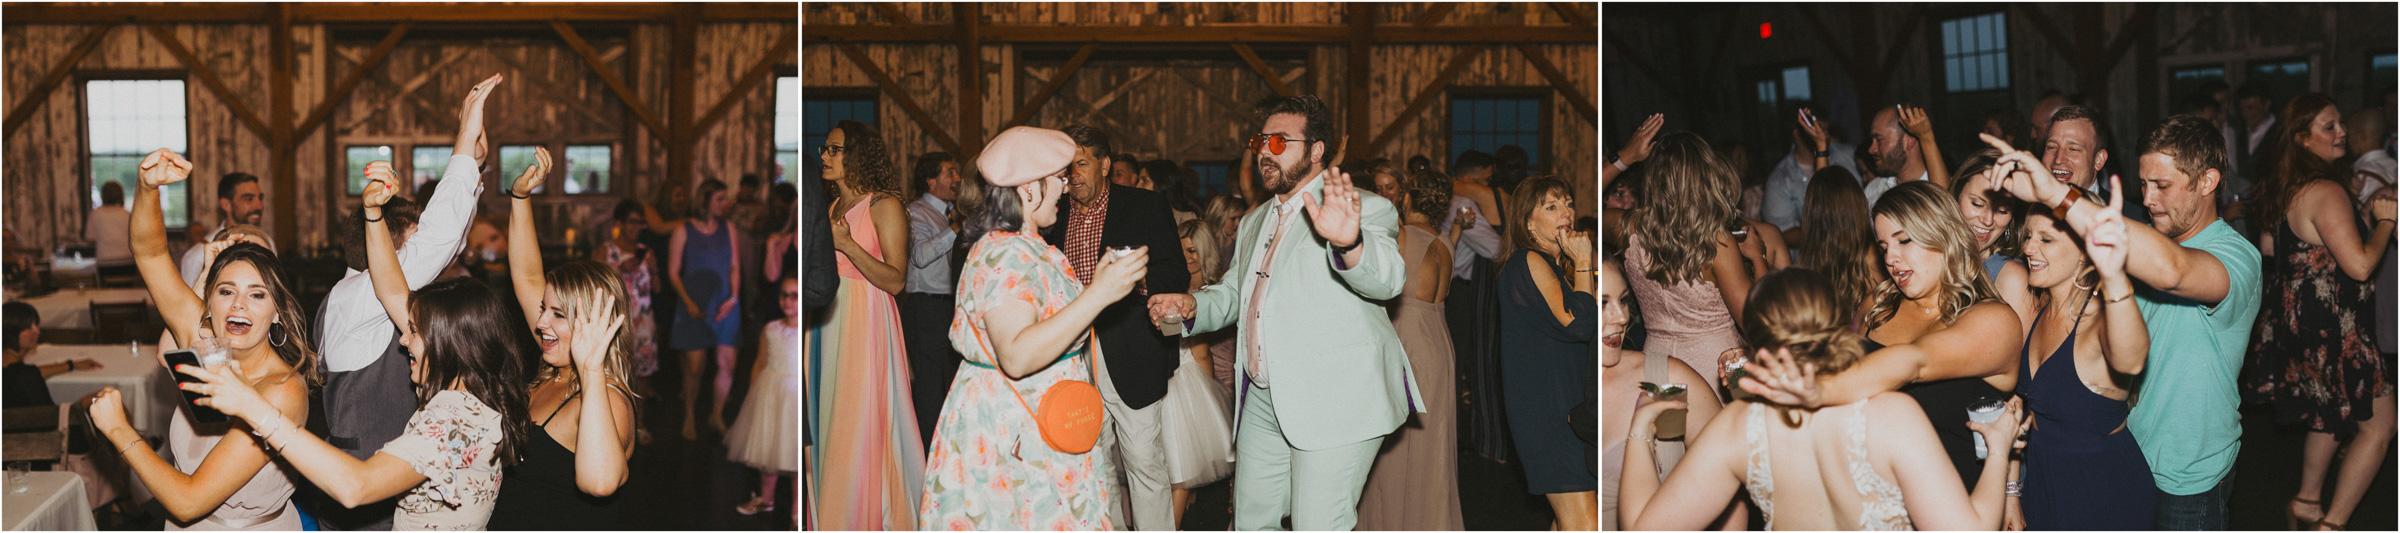 alyssa barletter photography weston red barn farm timberbarn summer outdoor wedding-68.jpg